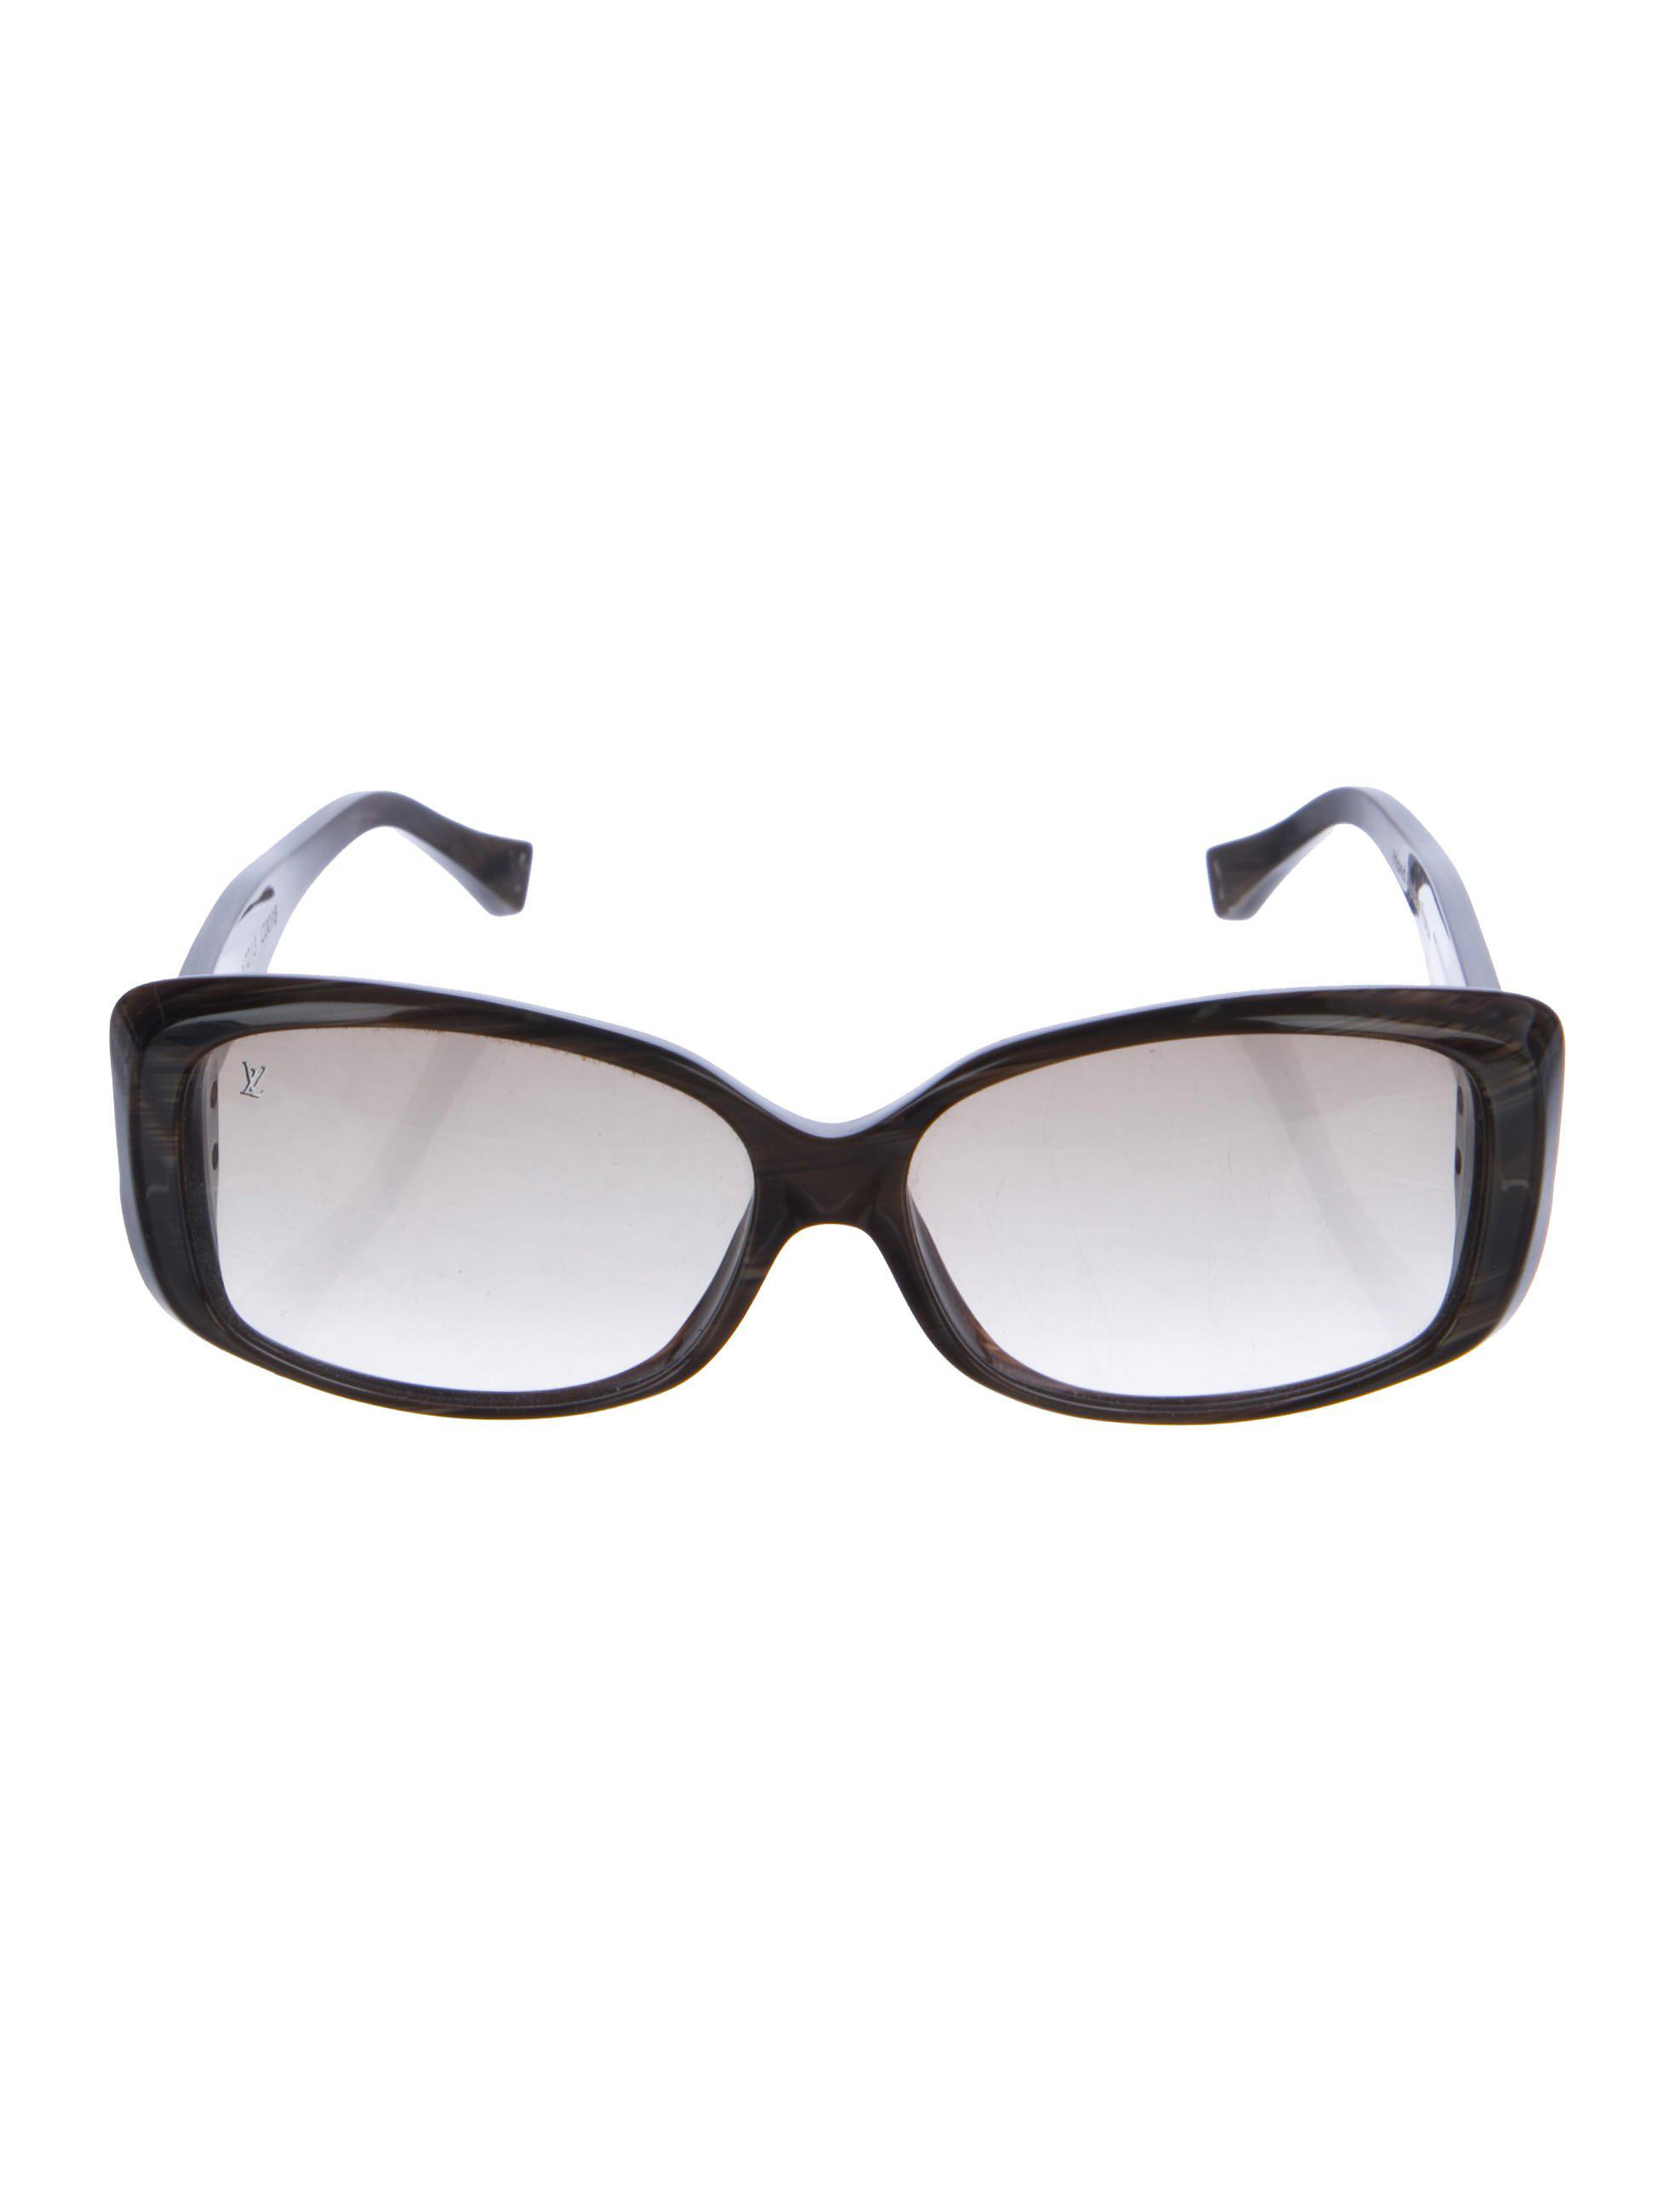 b7b27131da59 Lyst - Louis Vuitton Soupçon Gm Sunglasses Brown in Metallic